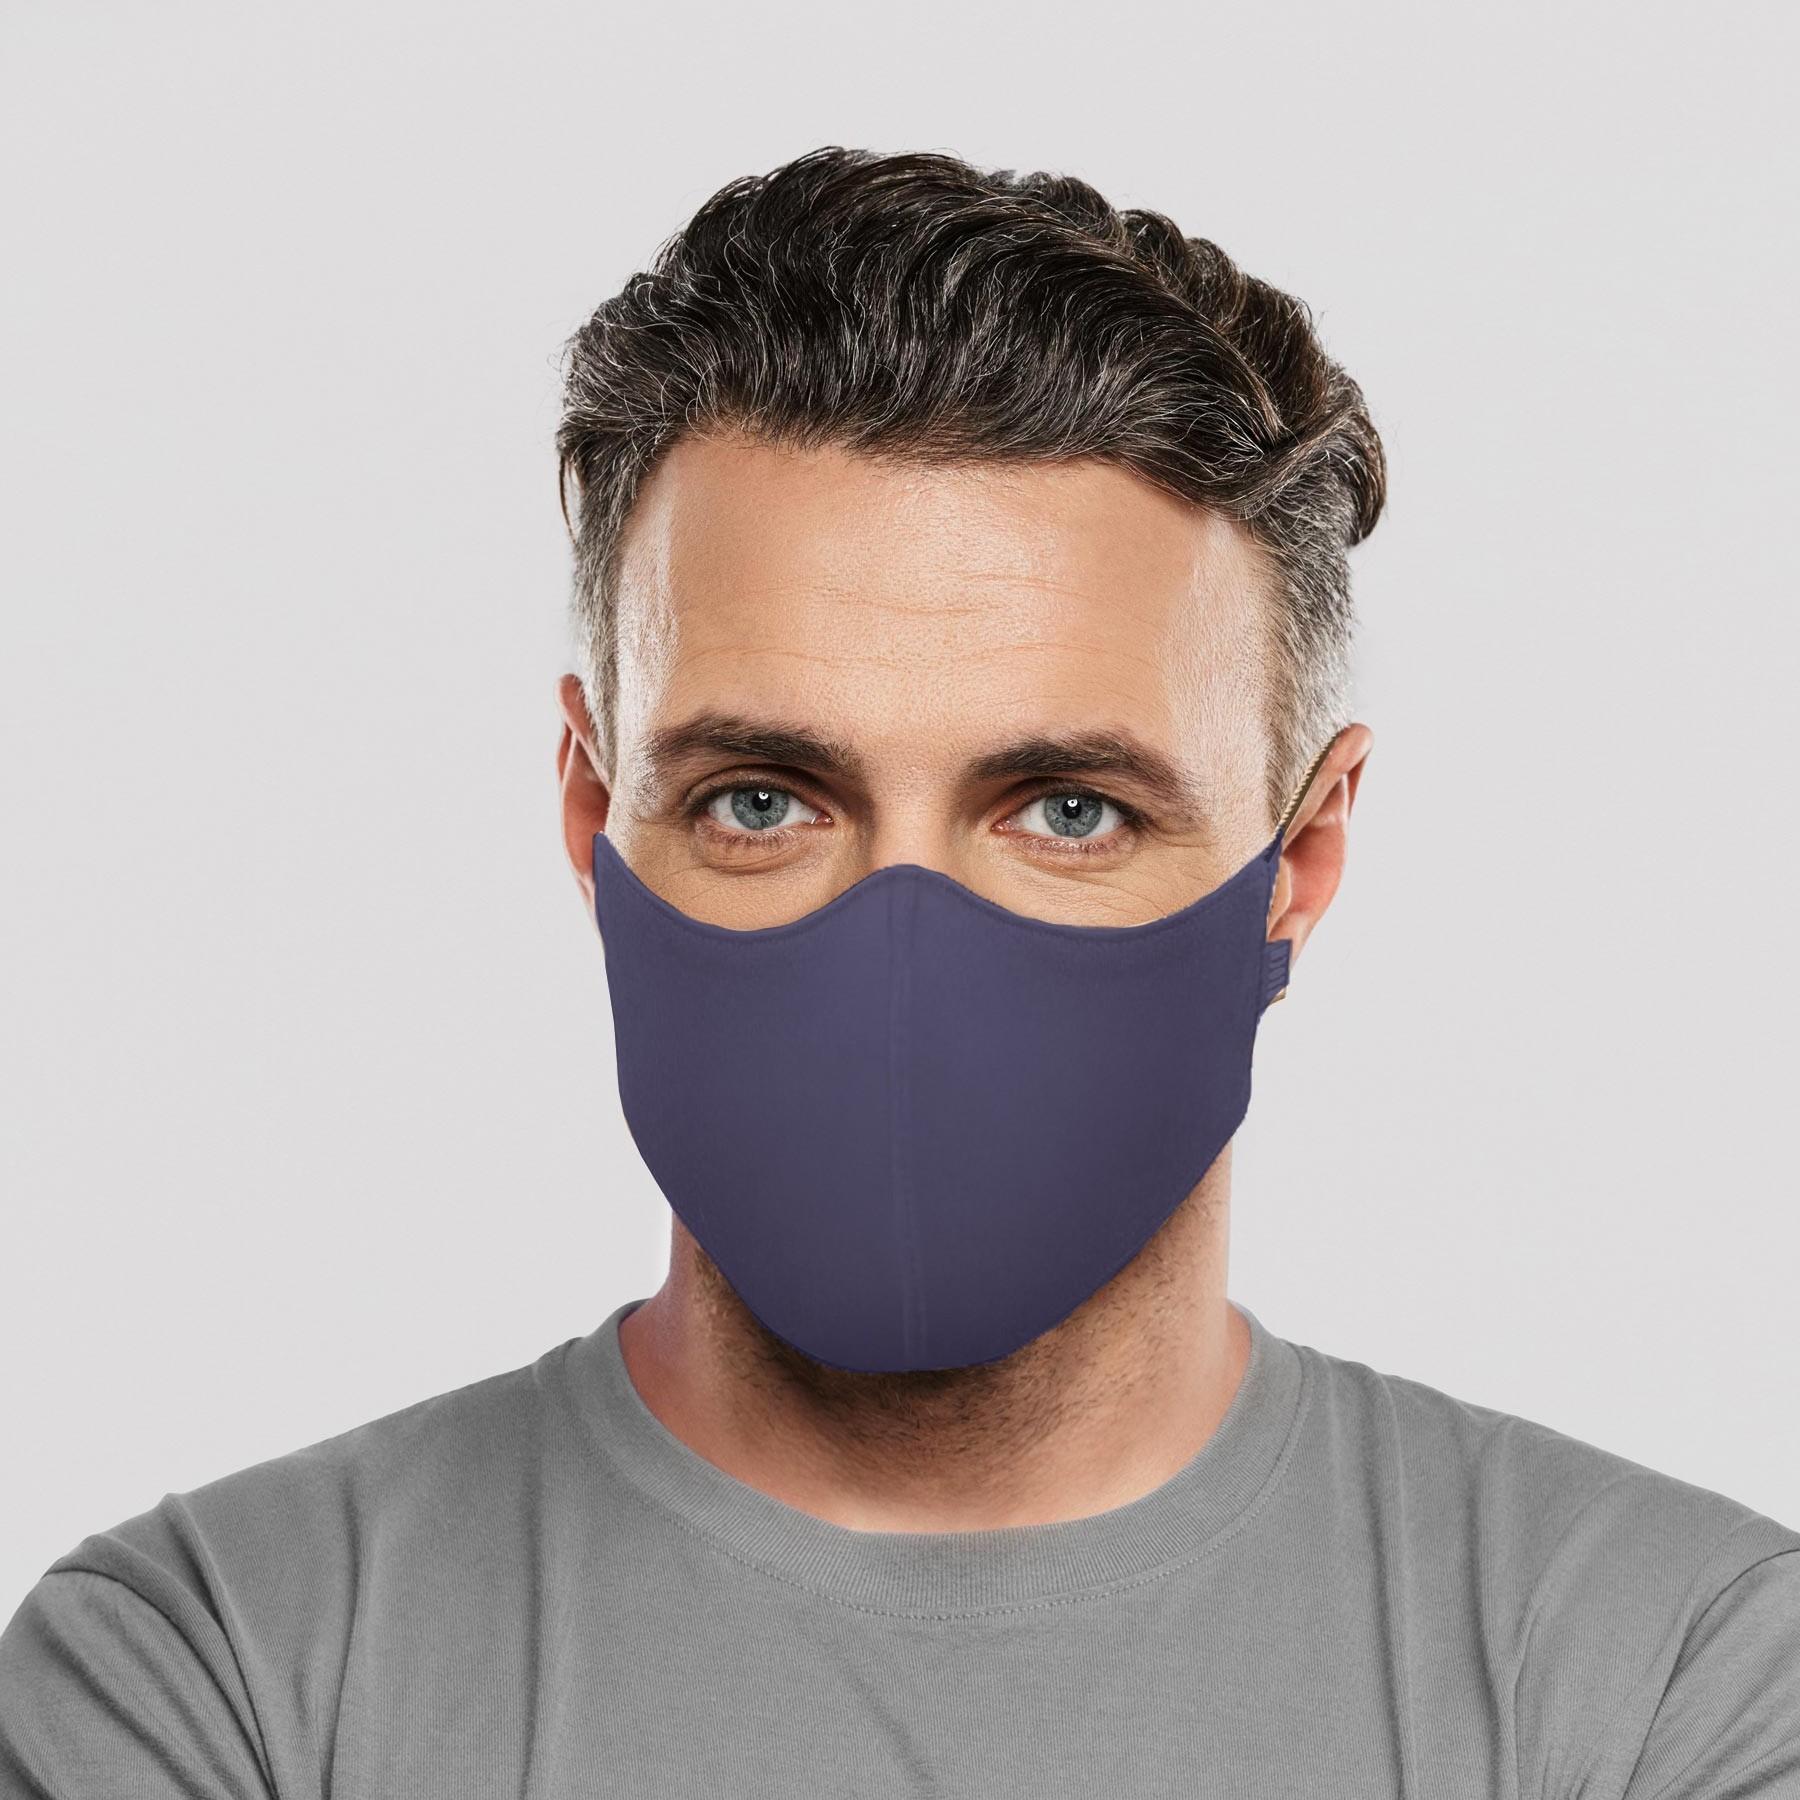 Bloch B-Safe Adult Face Mask Navy